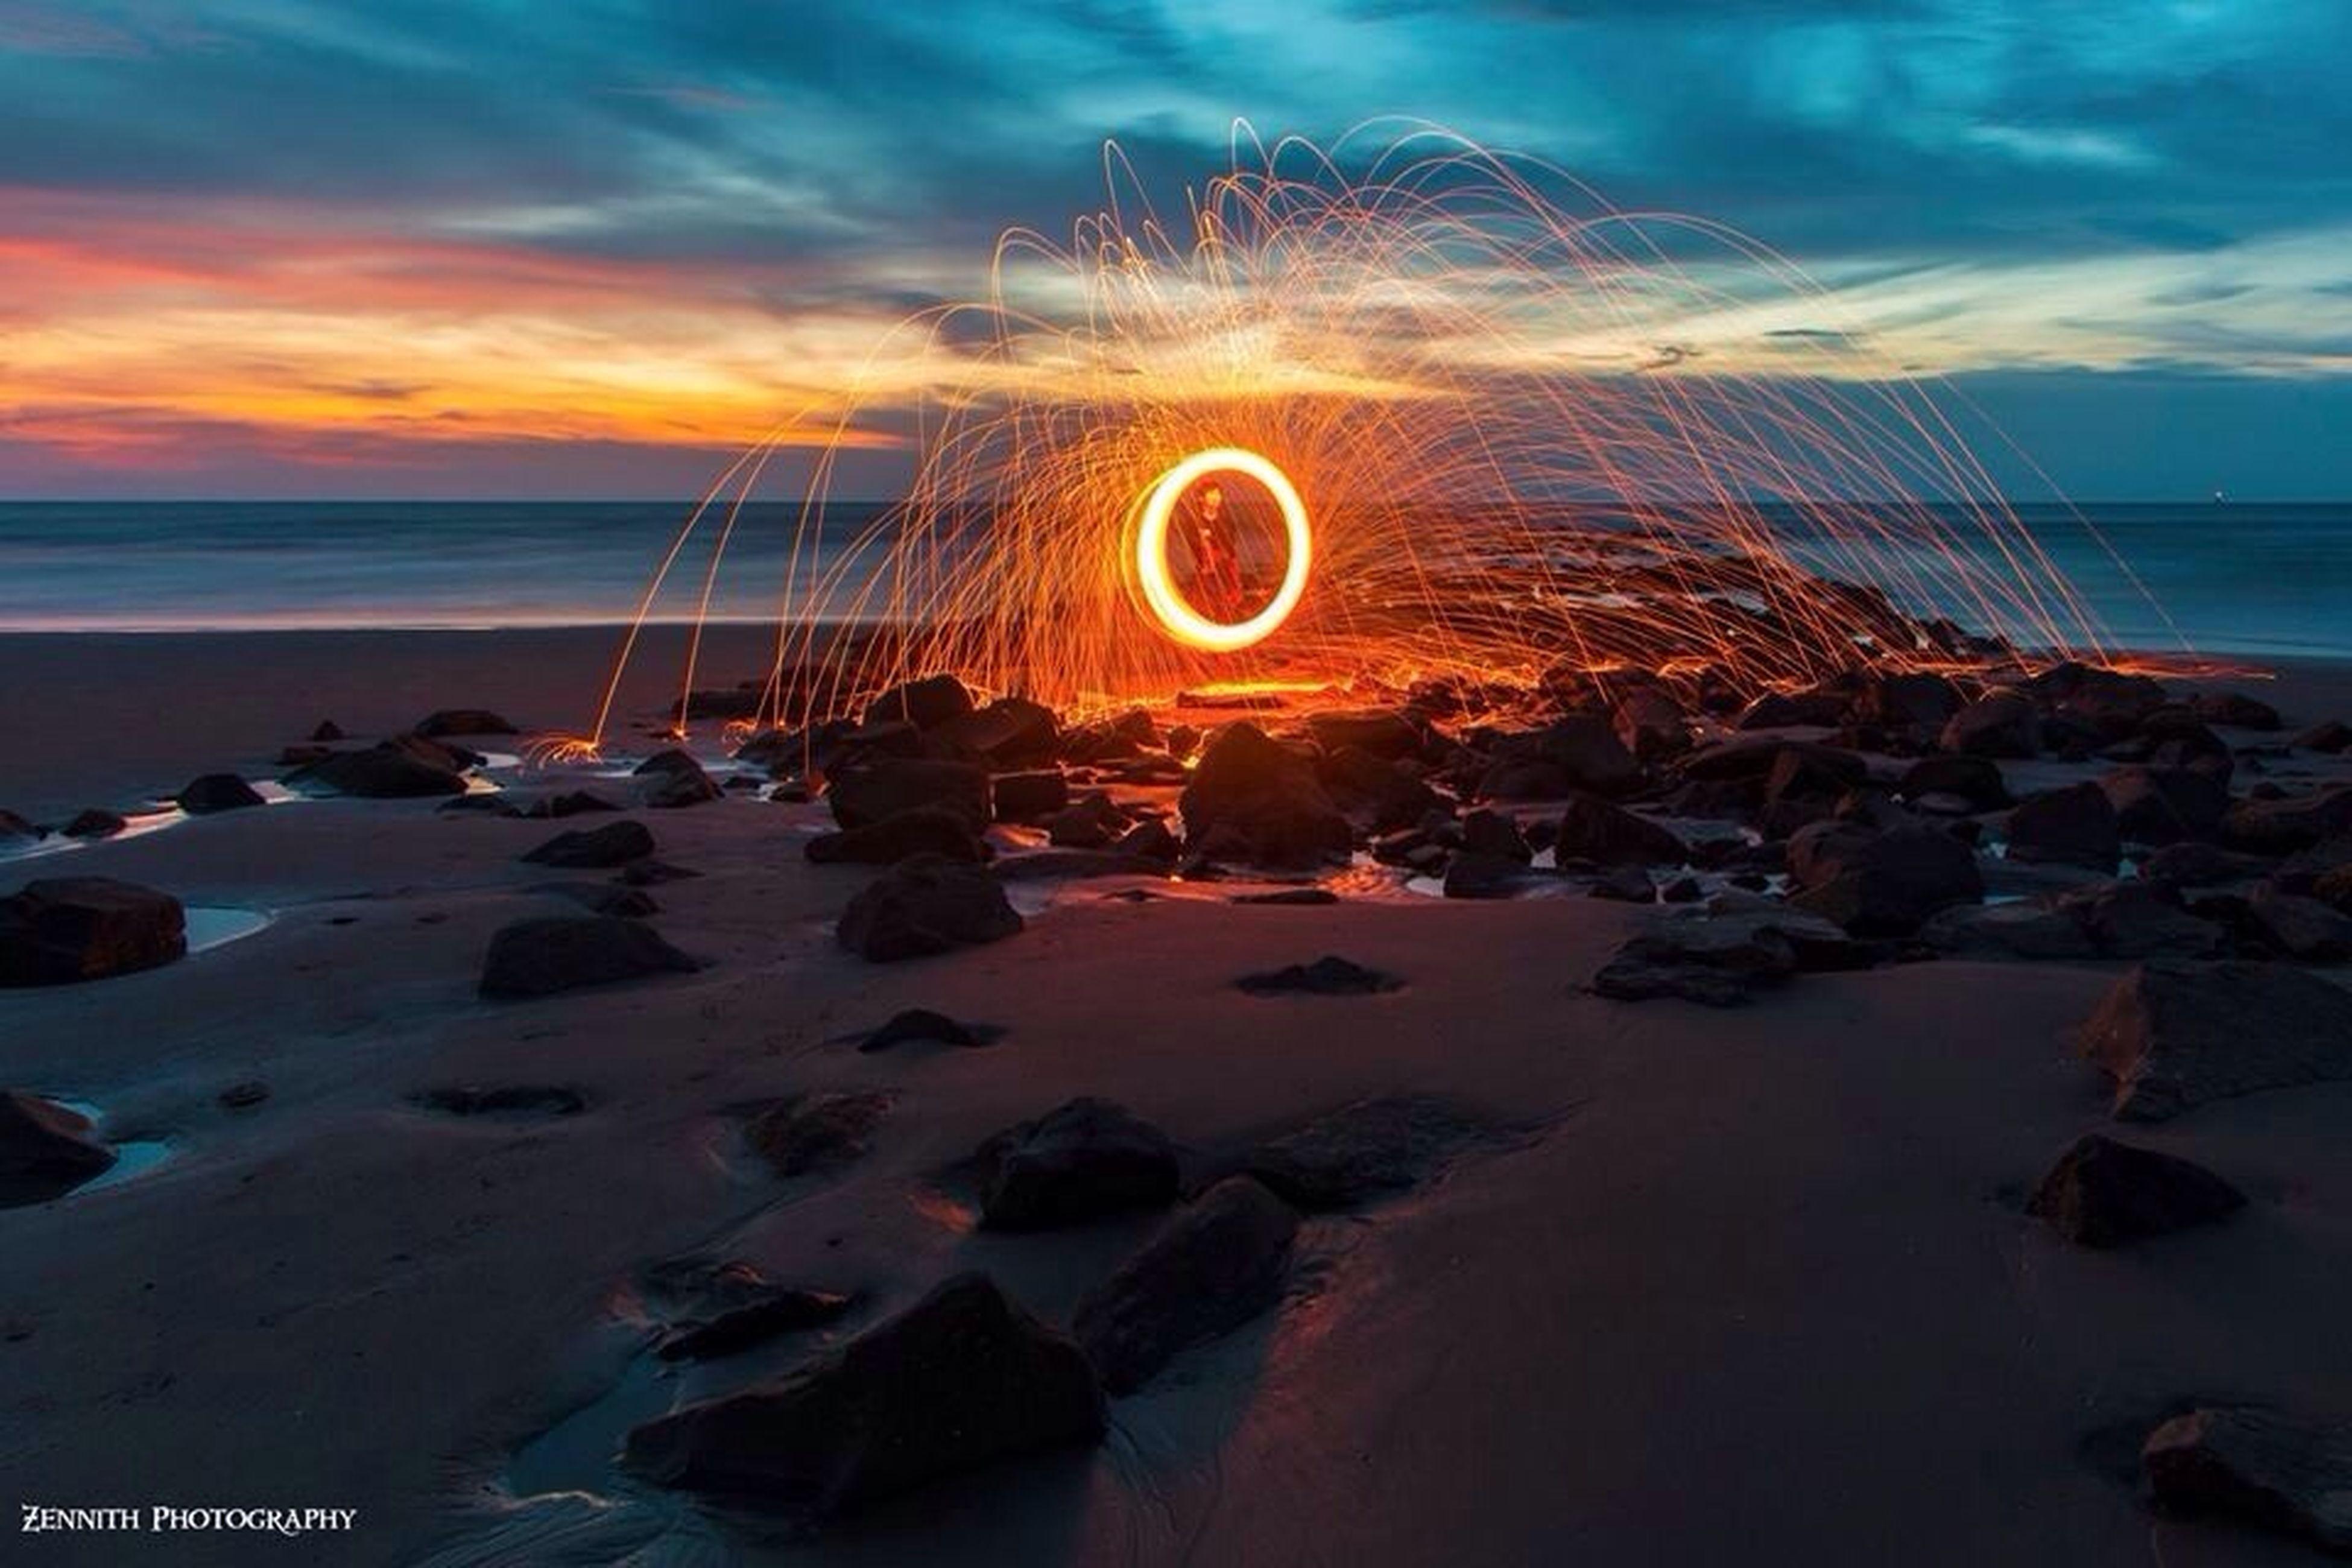 sea, beach, sunset, water, sky, horizon over water, shore, scenics, beauty in nature, sand, tranquil scene, cloud - sky, tranquility, nature, idyllic, sun, orange color, wave, cloud, coastline